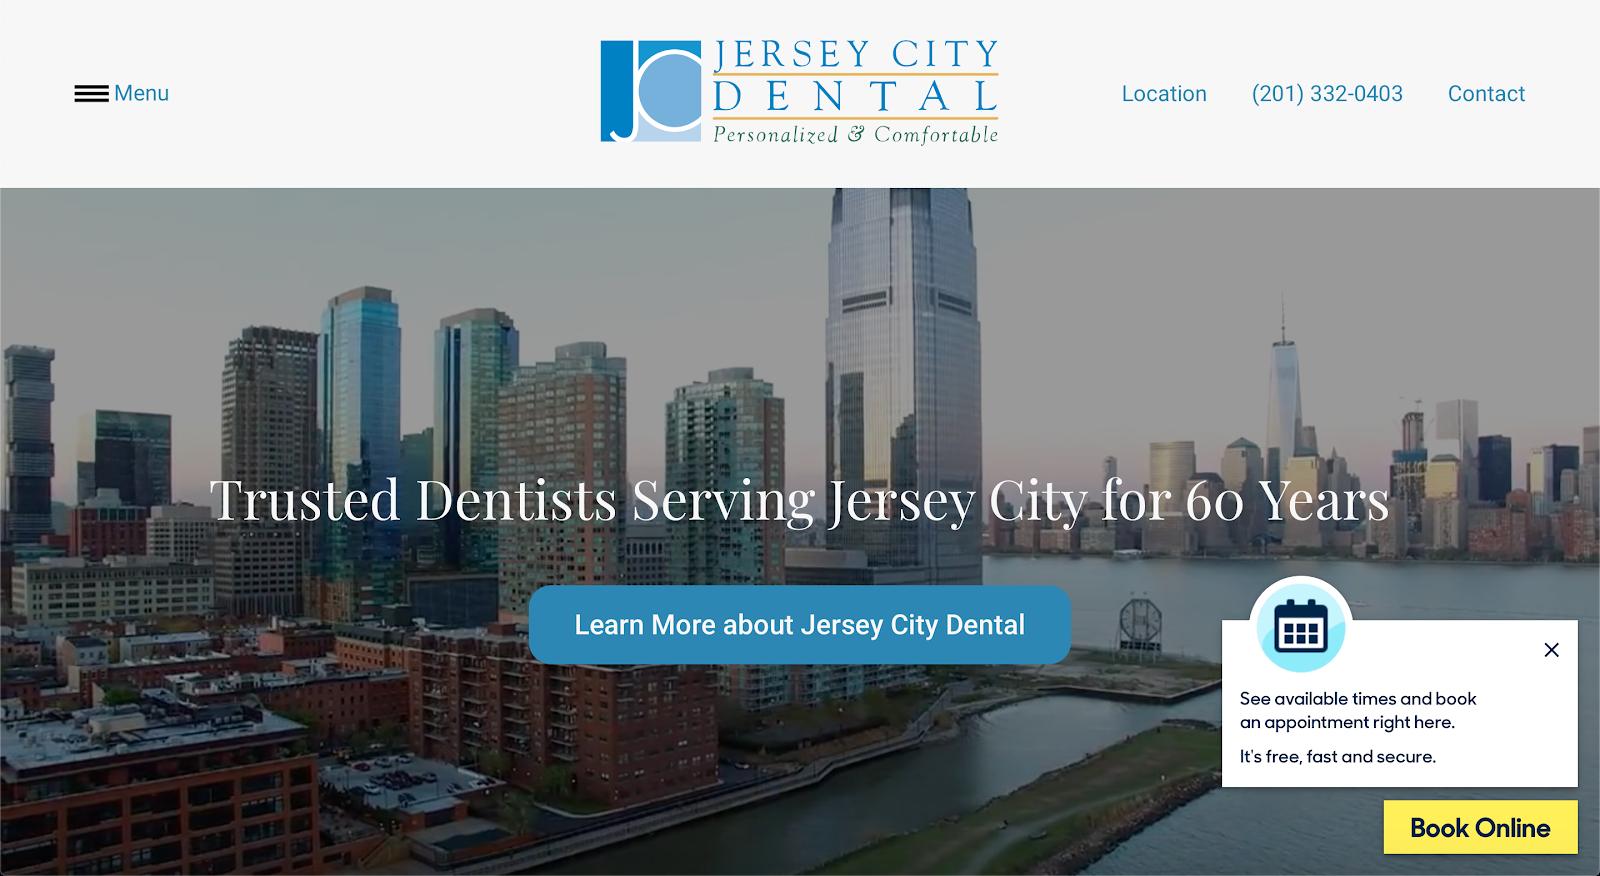 Jersey City Dental Top Website